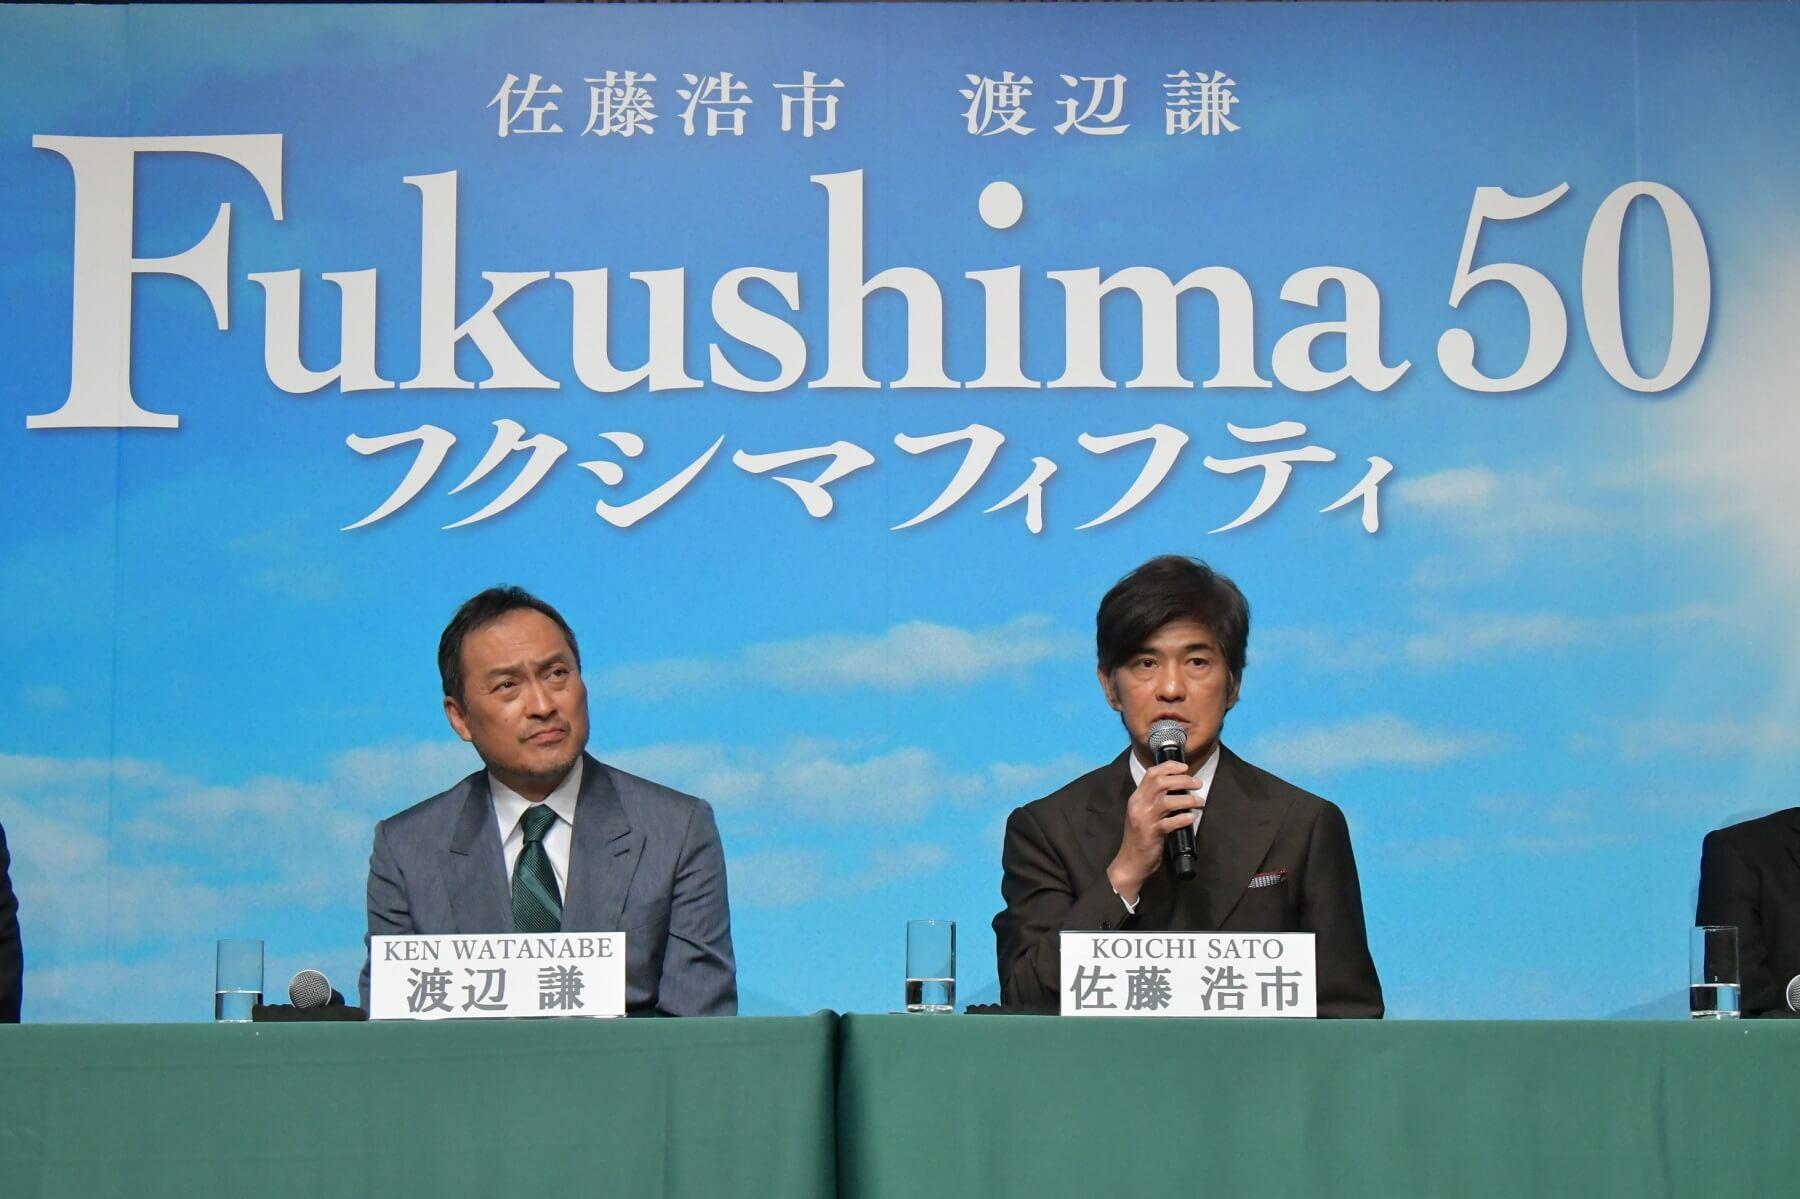 fukushima-50%ef%bc%88%e3%83%95%e3%82%af%e3%82%b7%e3%83%9e%e3%83%95%e3%82%a3%e3%83%95%e3%83%86%e3%82%a3%ef%bc%89